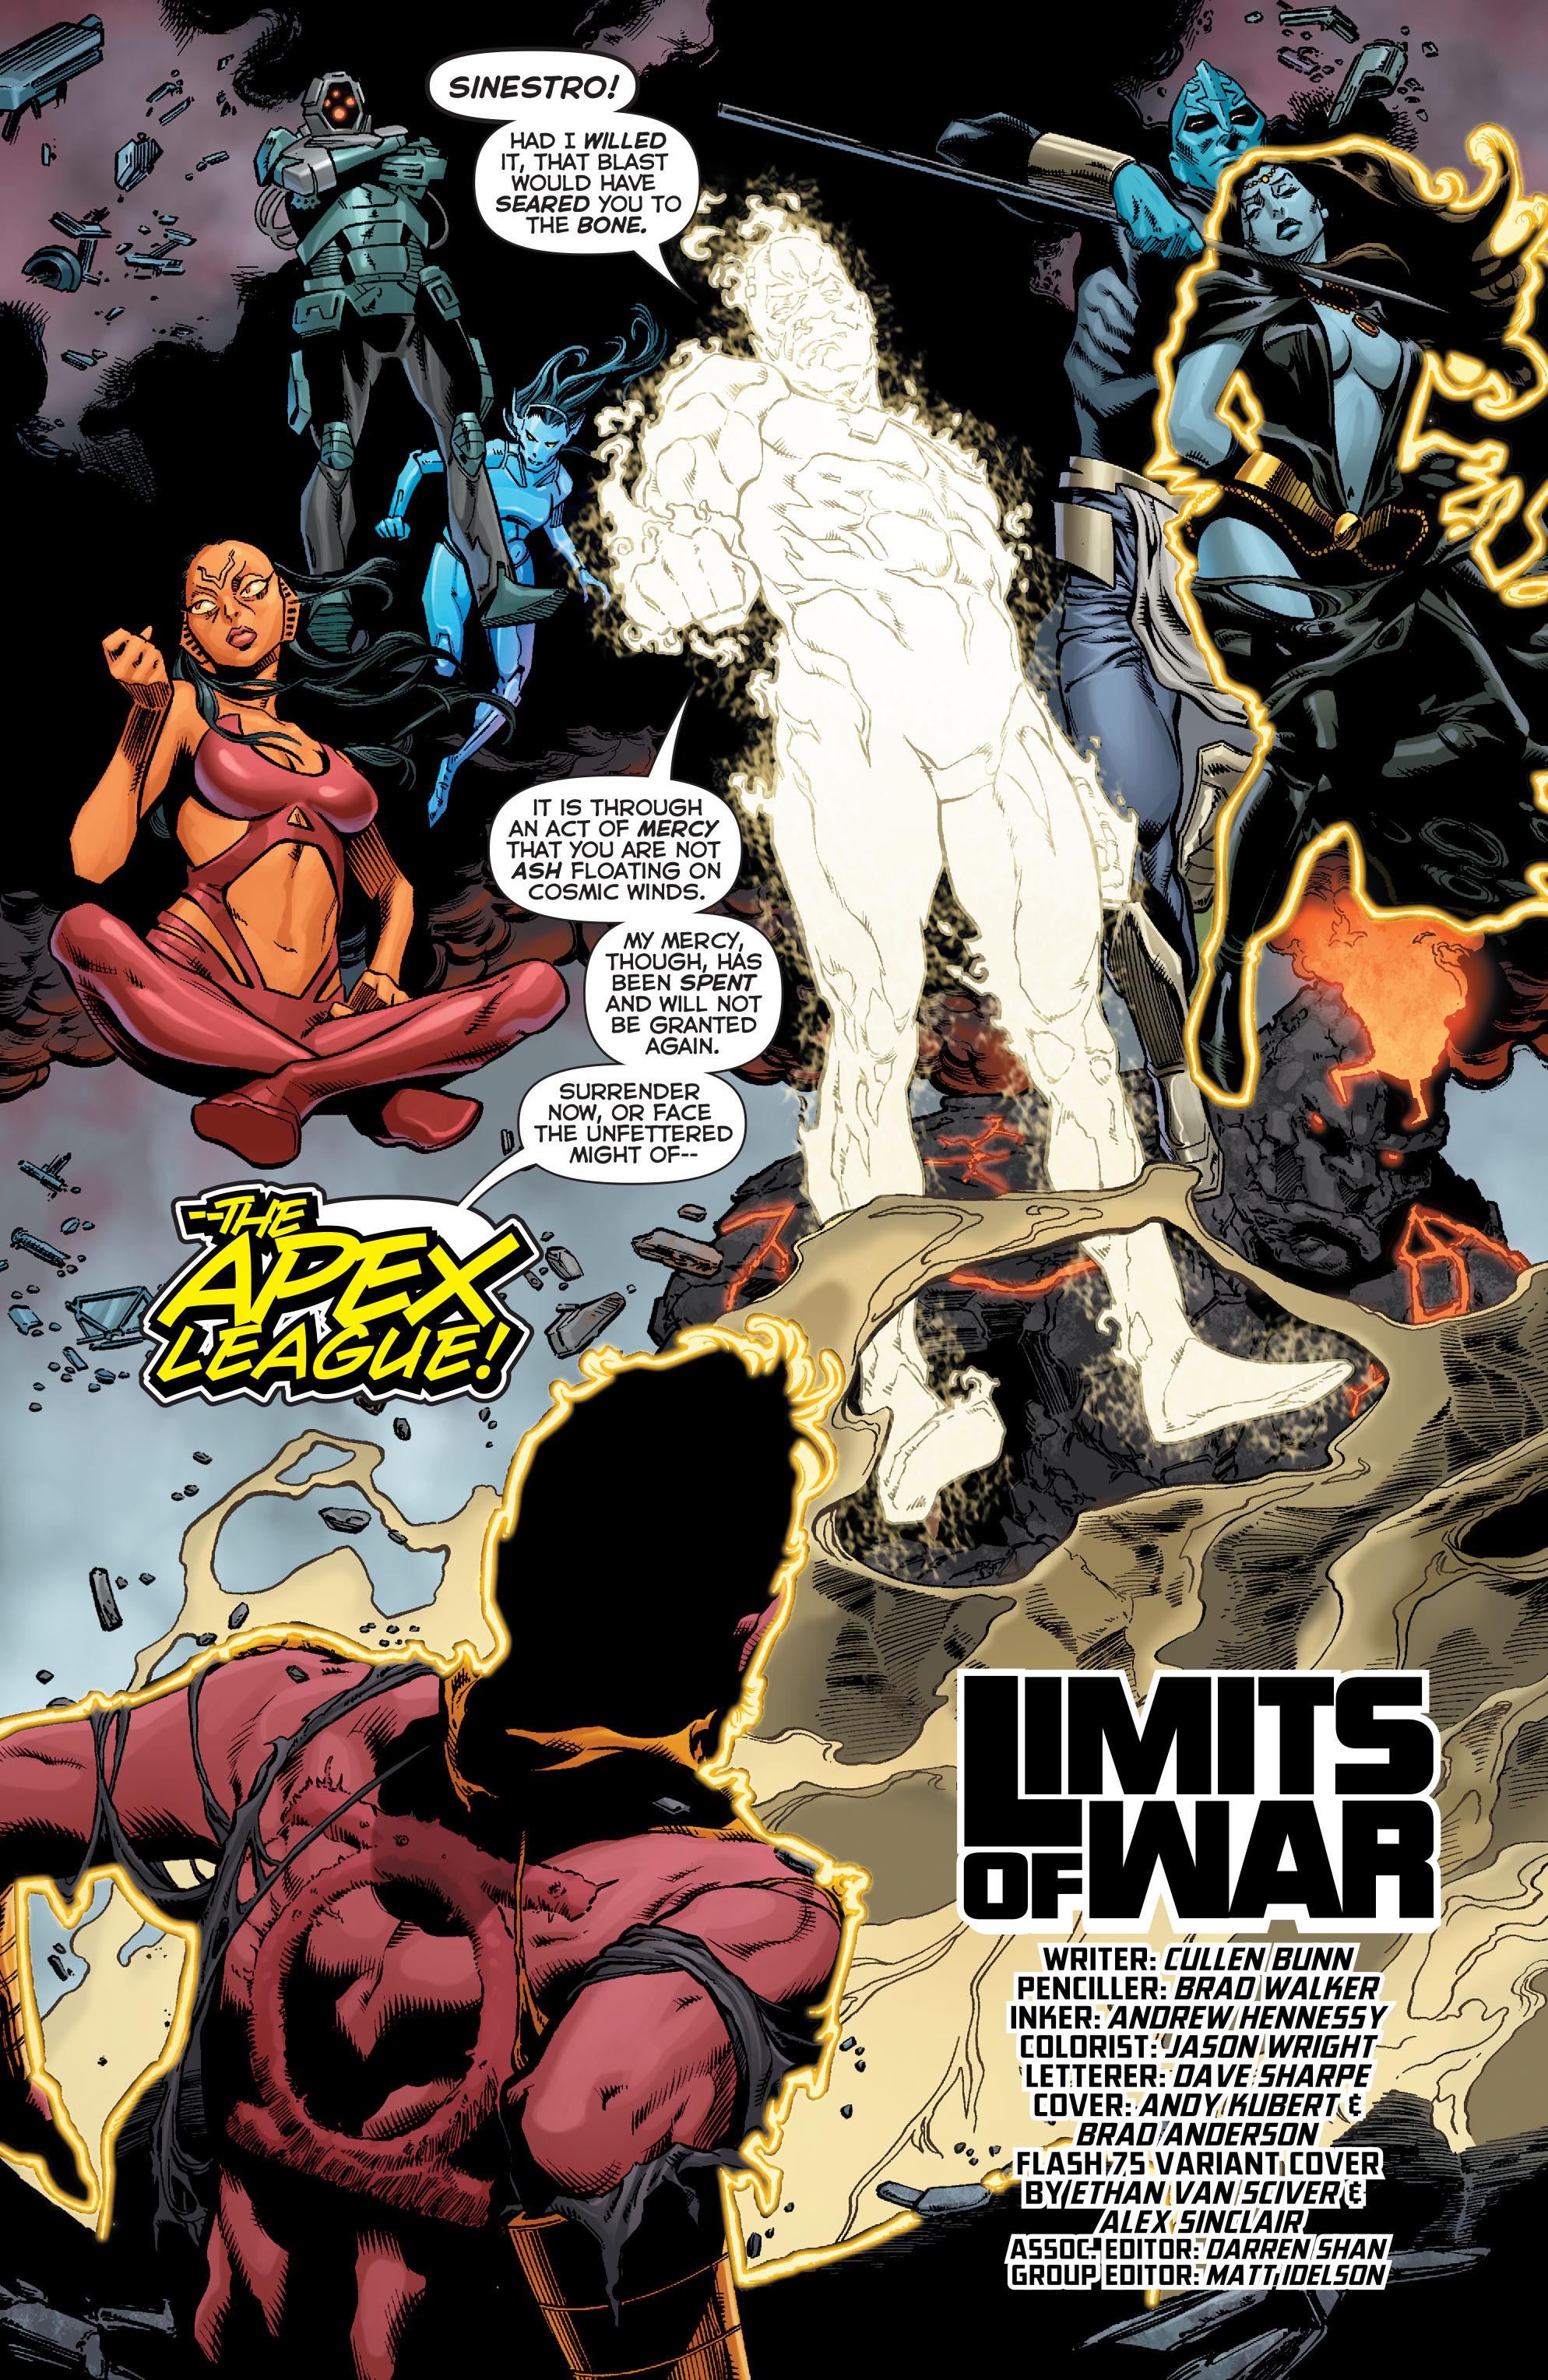 Read online Sinestro comic -  Issue #9 - 21